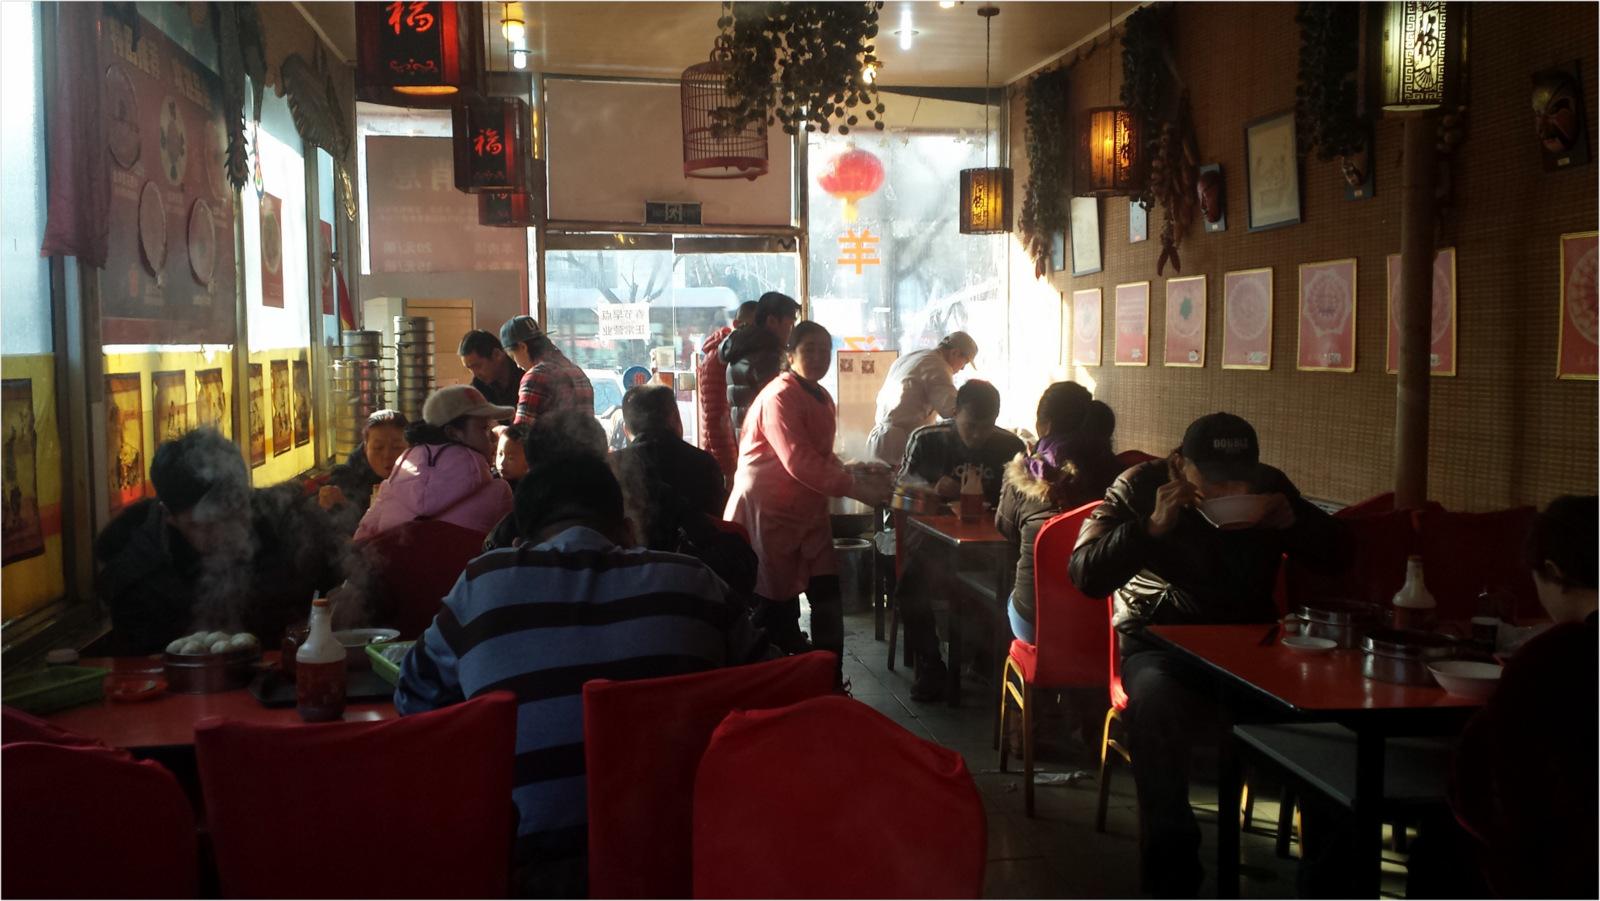 Restaurant Beijing - Breakfast time